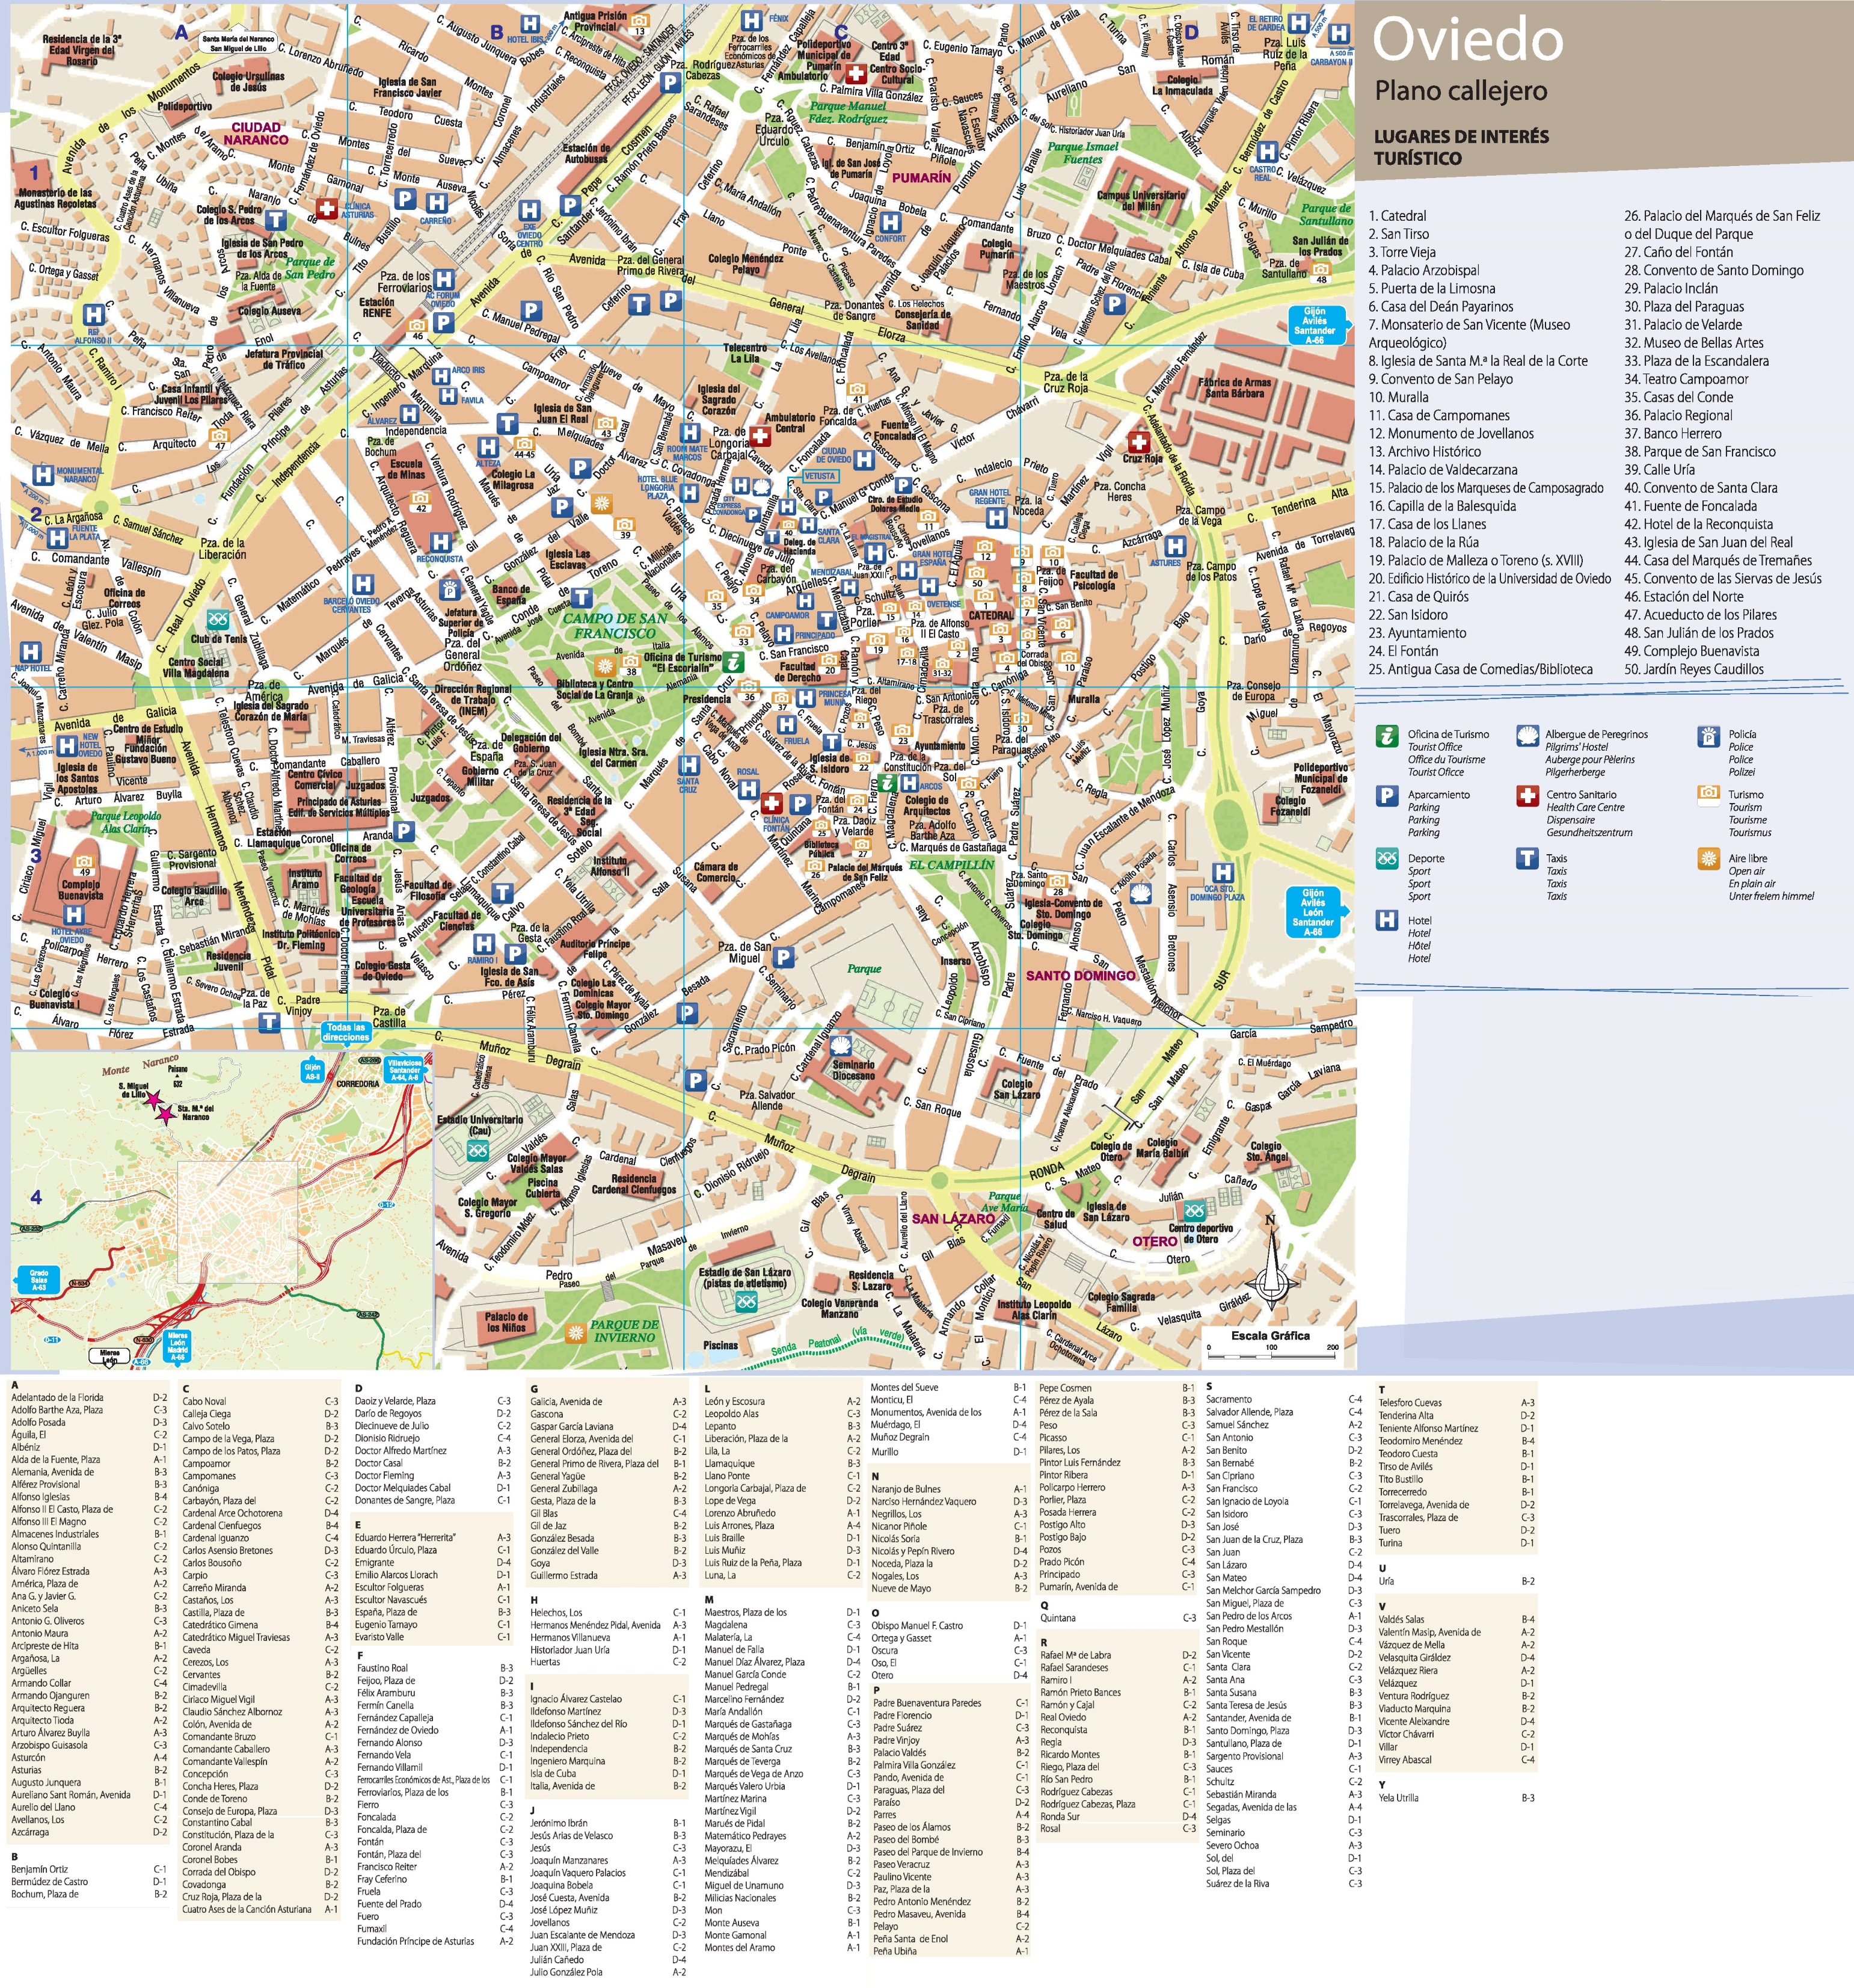 Map Of Spain Oviedo.Oviedo Tourist Map